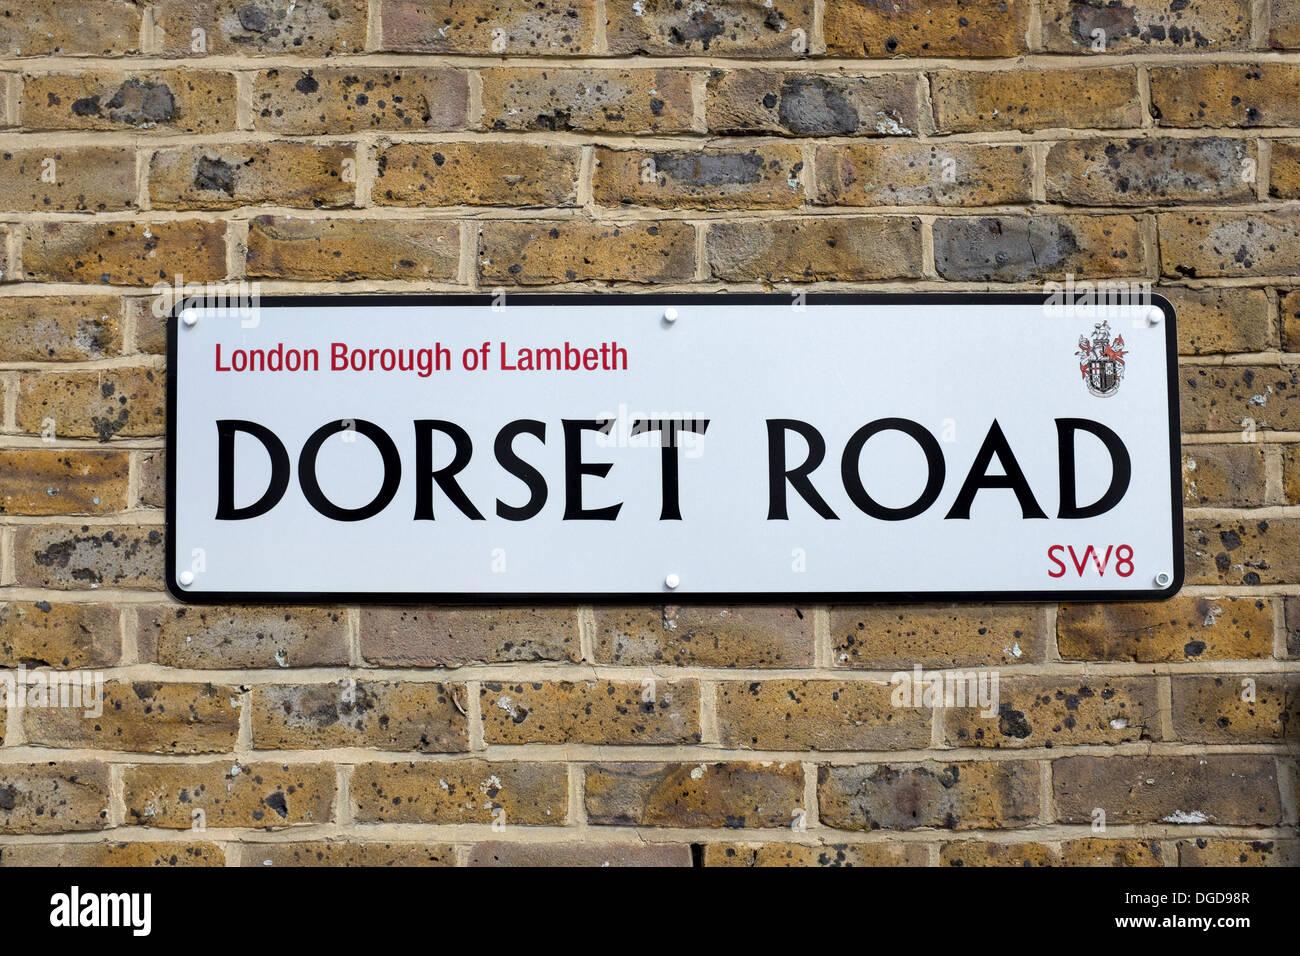 Dorset Road Lambeth London - Stock Image